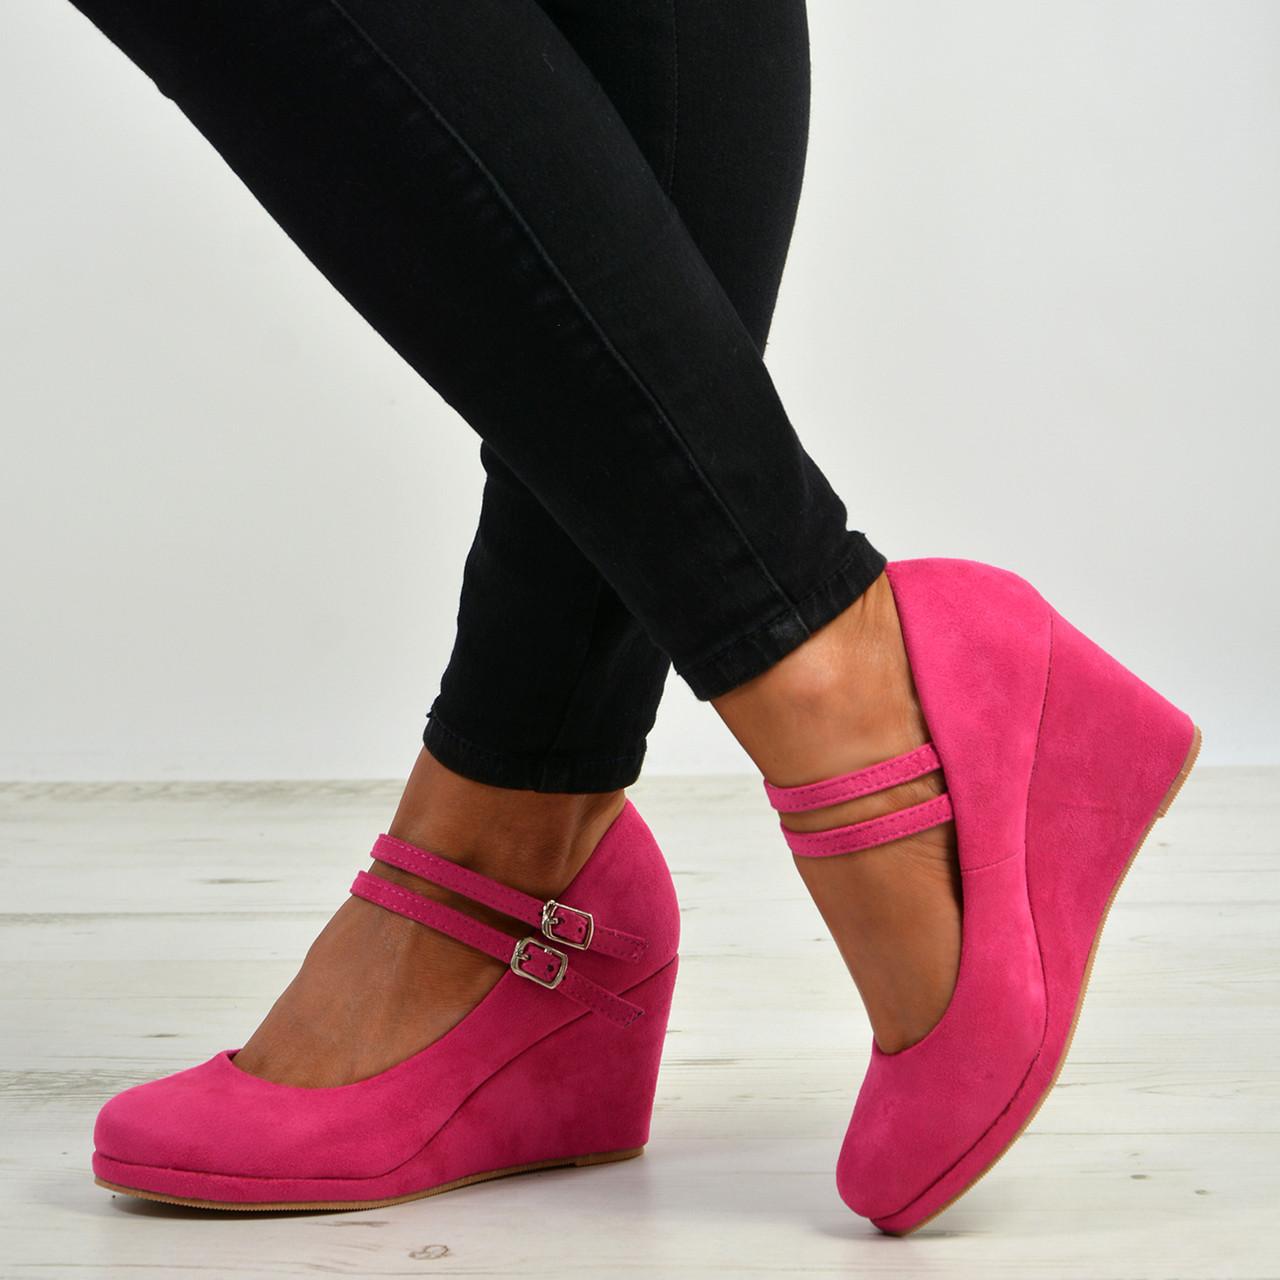 a7e4017f5f Womens Ladies High Wedge Heel Pumps Platform Double Strap Shoes Size Uk 3-8